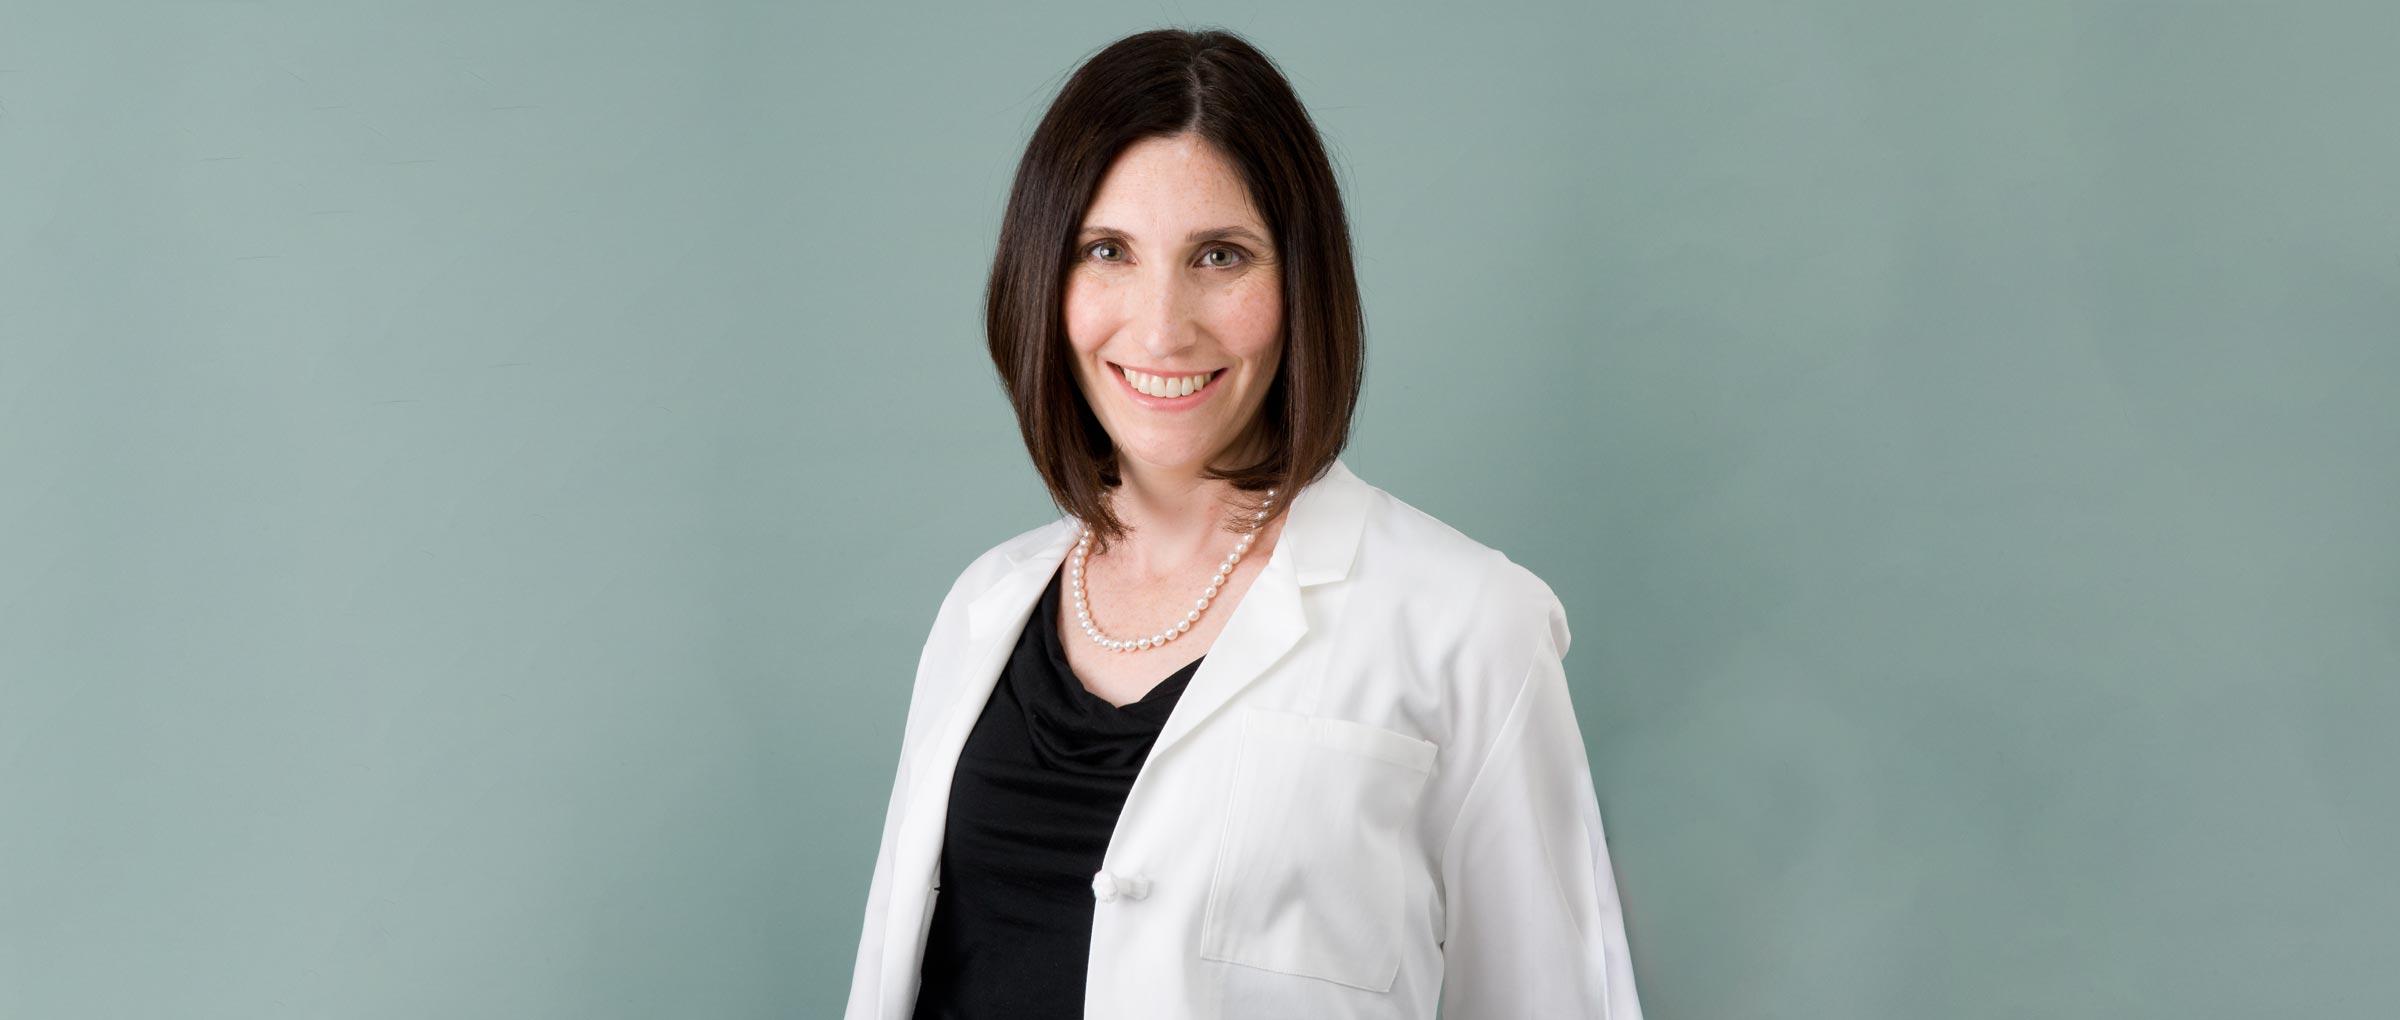 Dr. Barbieri